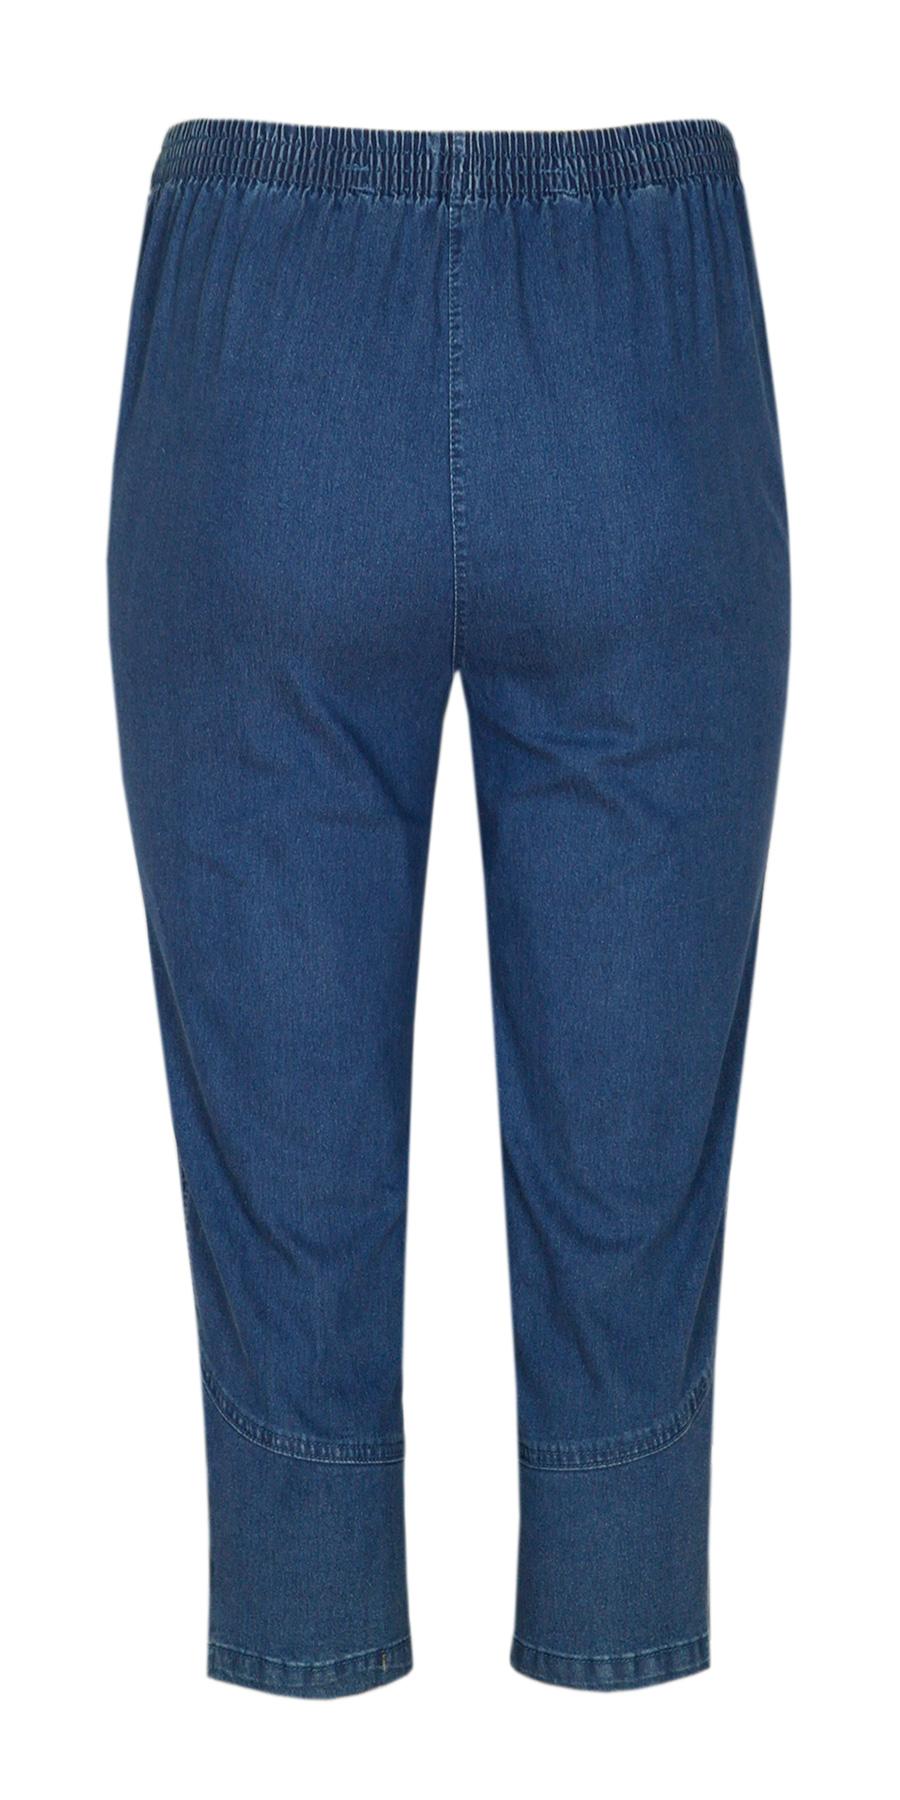 damen capri stretch jeans caprihose schlupfhose 3 4 l nge knopfleiste am saum ebay. Black Bedroom Furniture Sets. Home Design Ideas